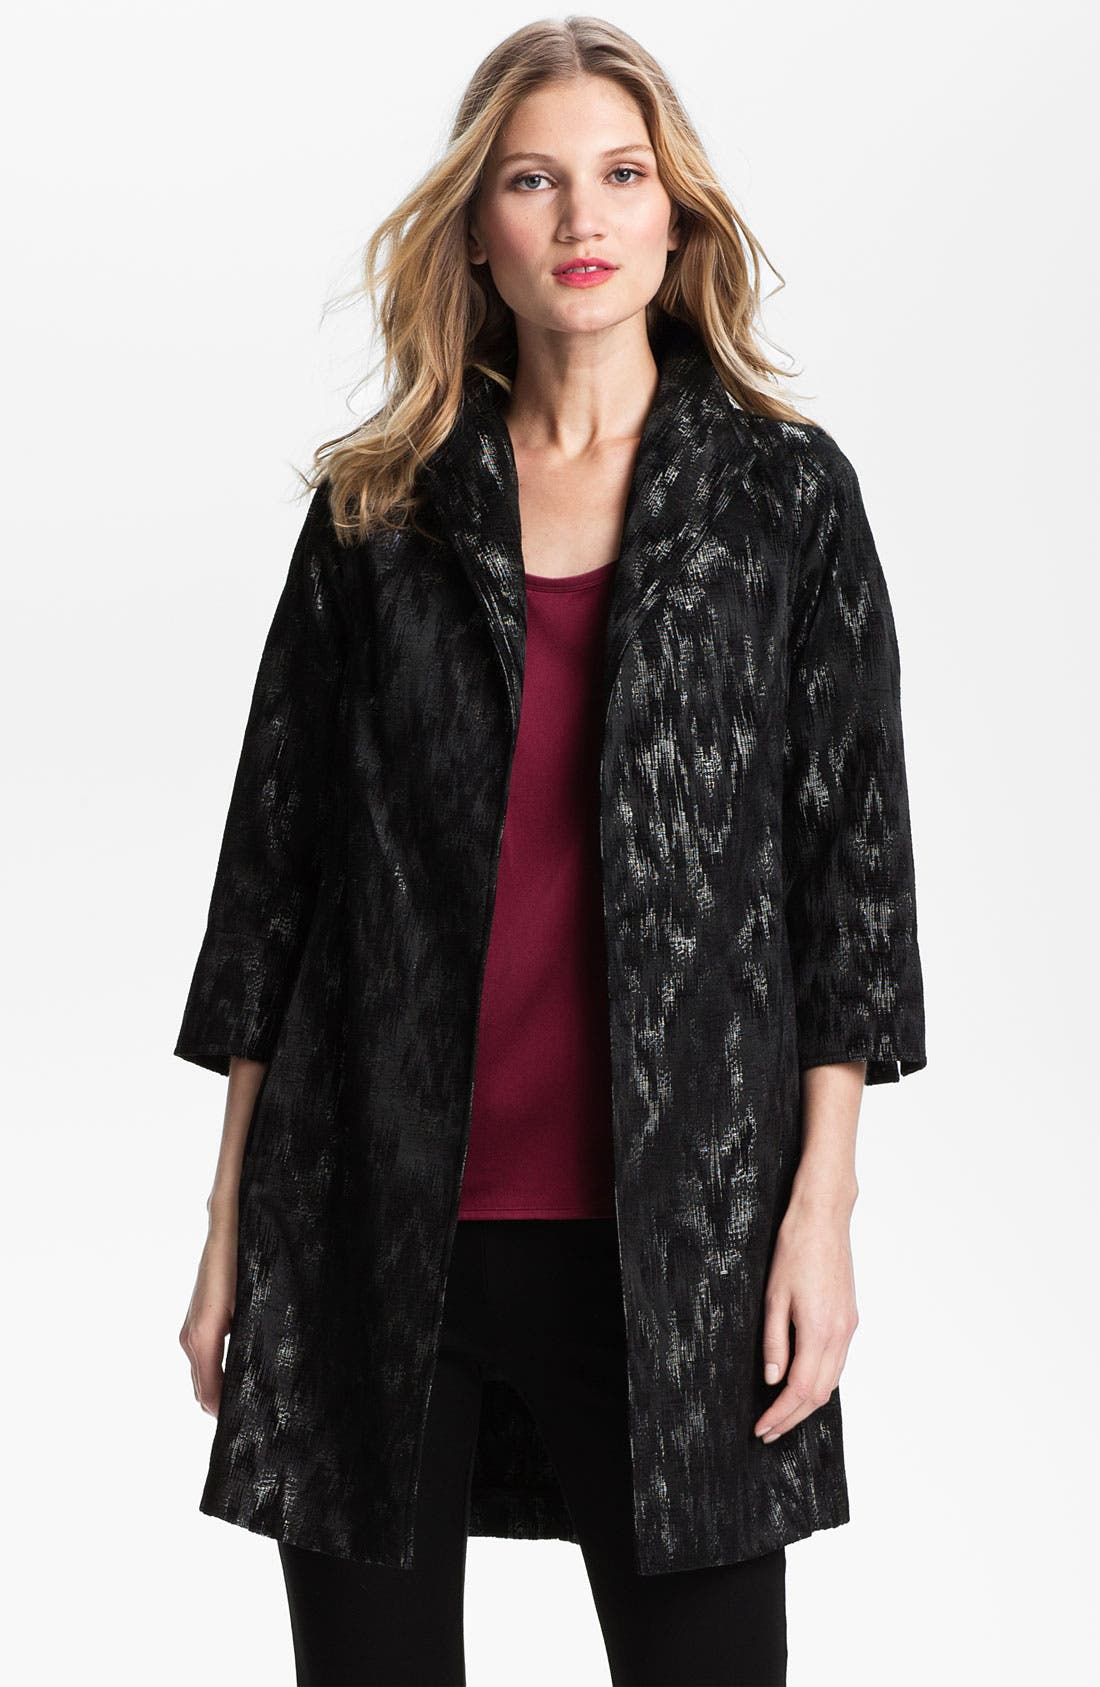 Alternate Image 1 Selected - Eileen Fisher Ikat Jacquard Coat (Petite)